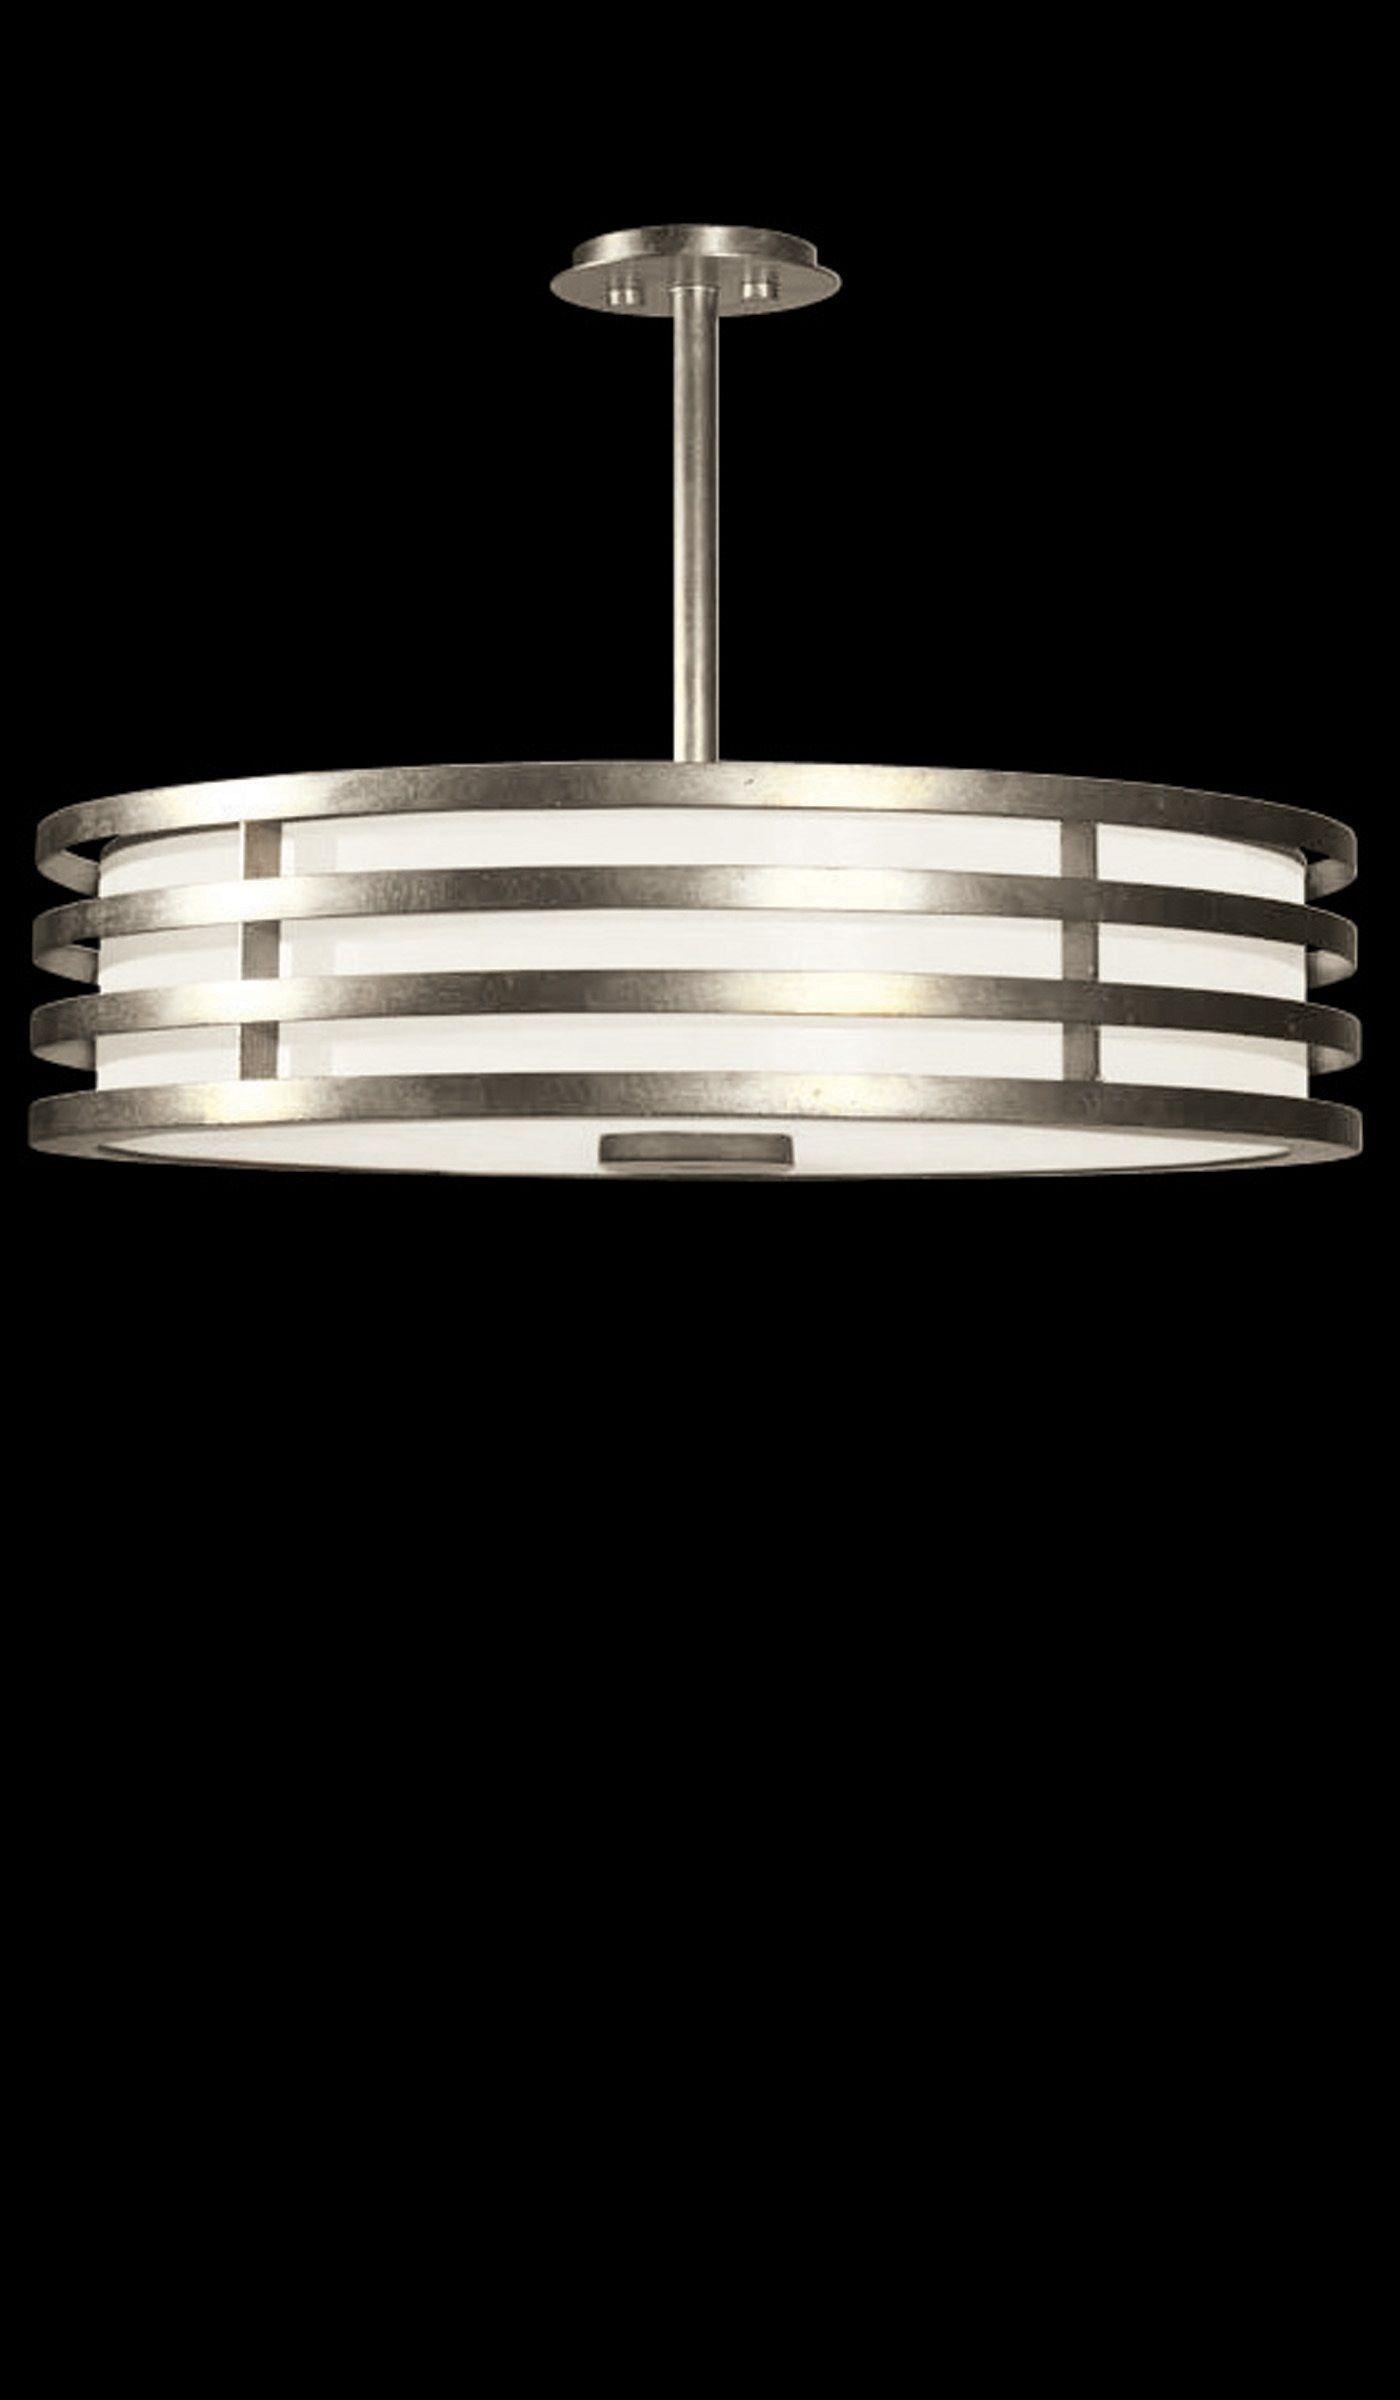 Drum pendant drum pendants drum pendant lighting pendant drum pendant drum pendants drum pendant lighting pendant chandelier pendant light fixtures3 arubaitofo Gallery